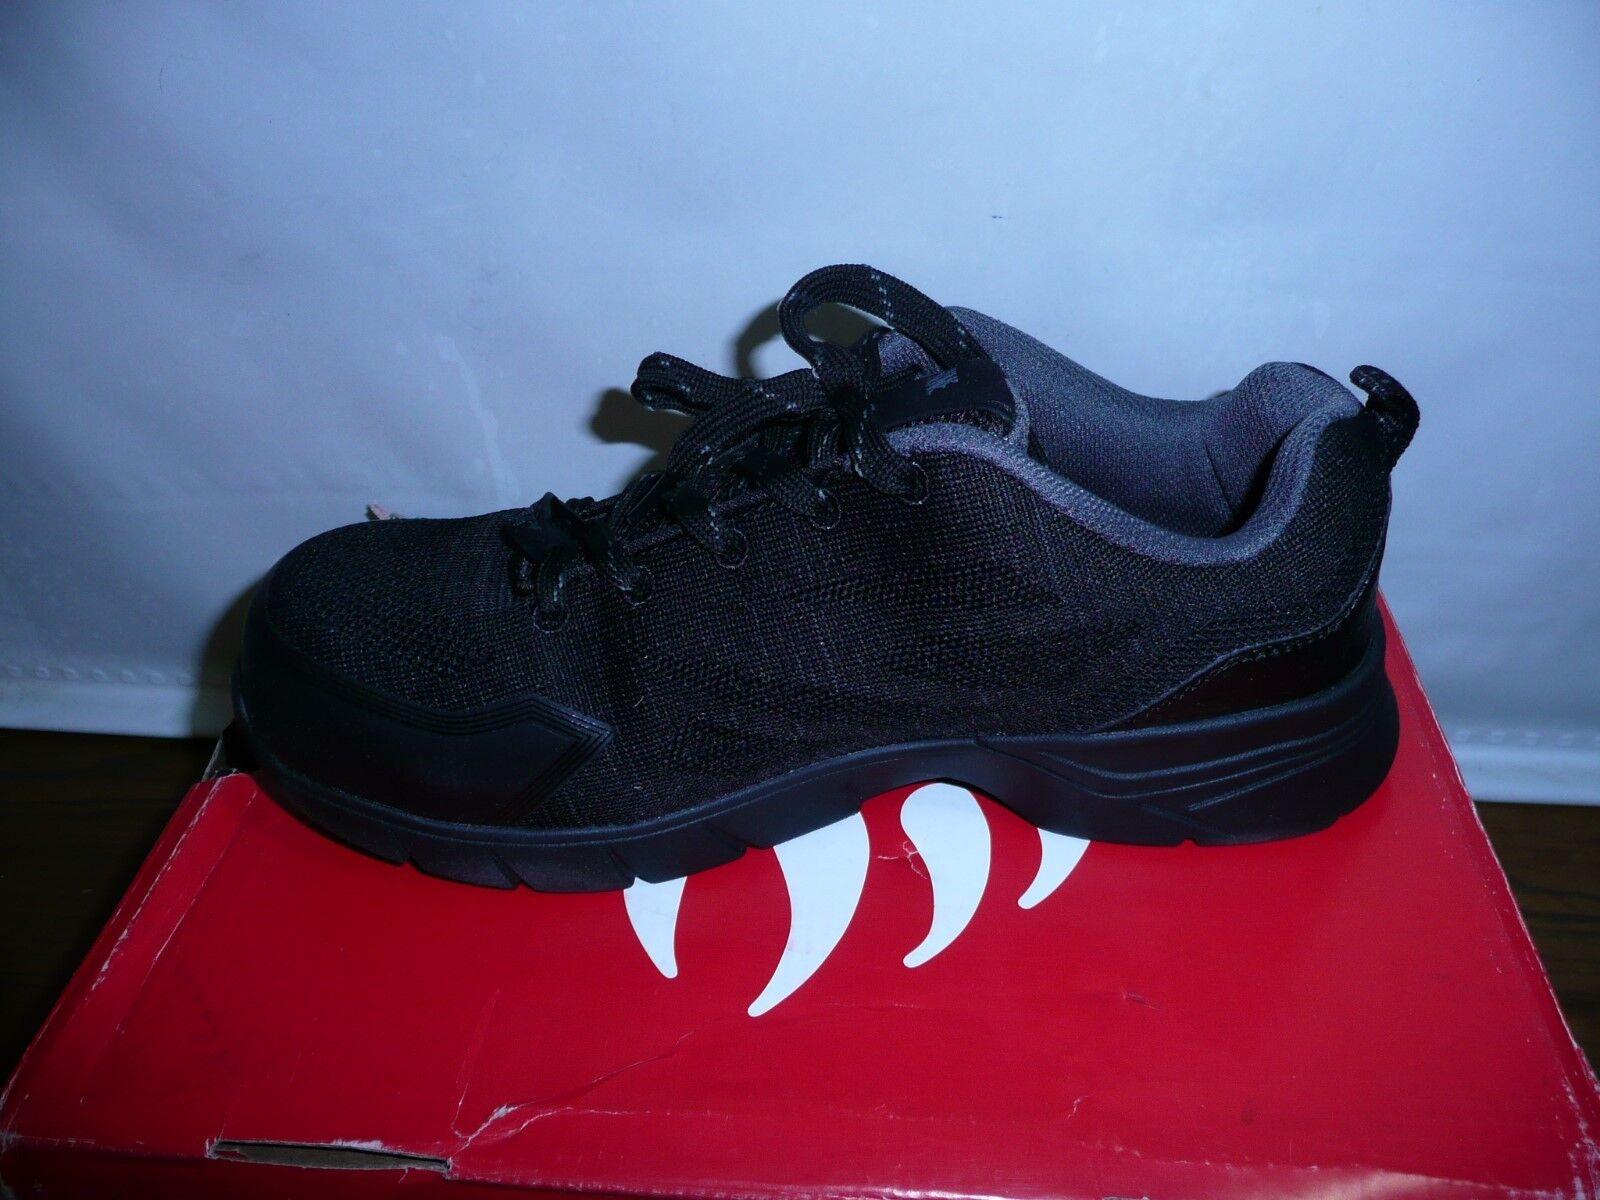 Wolverine Women's Jetstream 2 Composite-Toe Industrial shoes, Black, Black, Black, 9 W US 5426d7